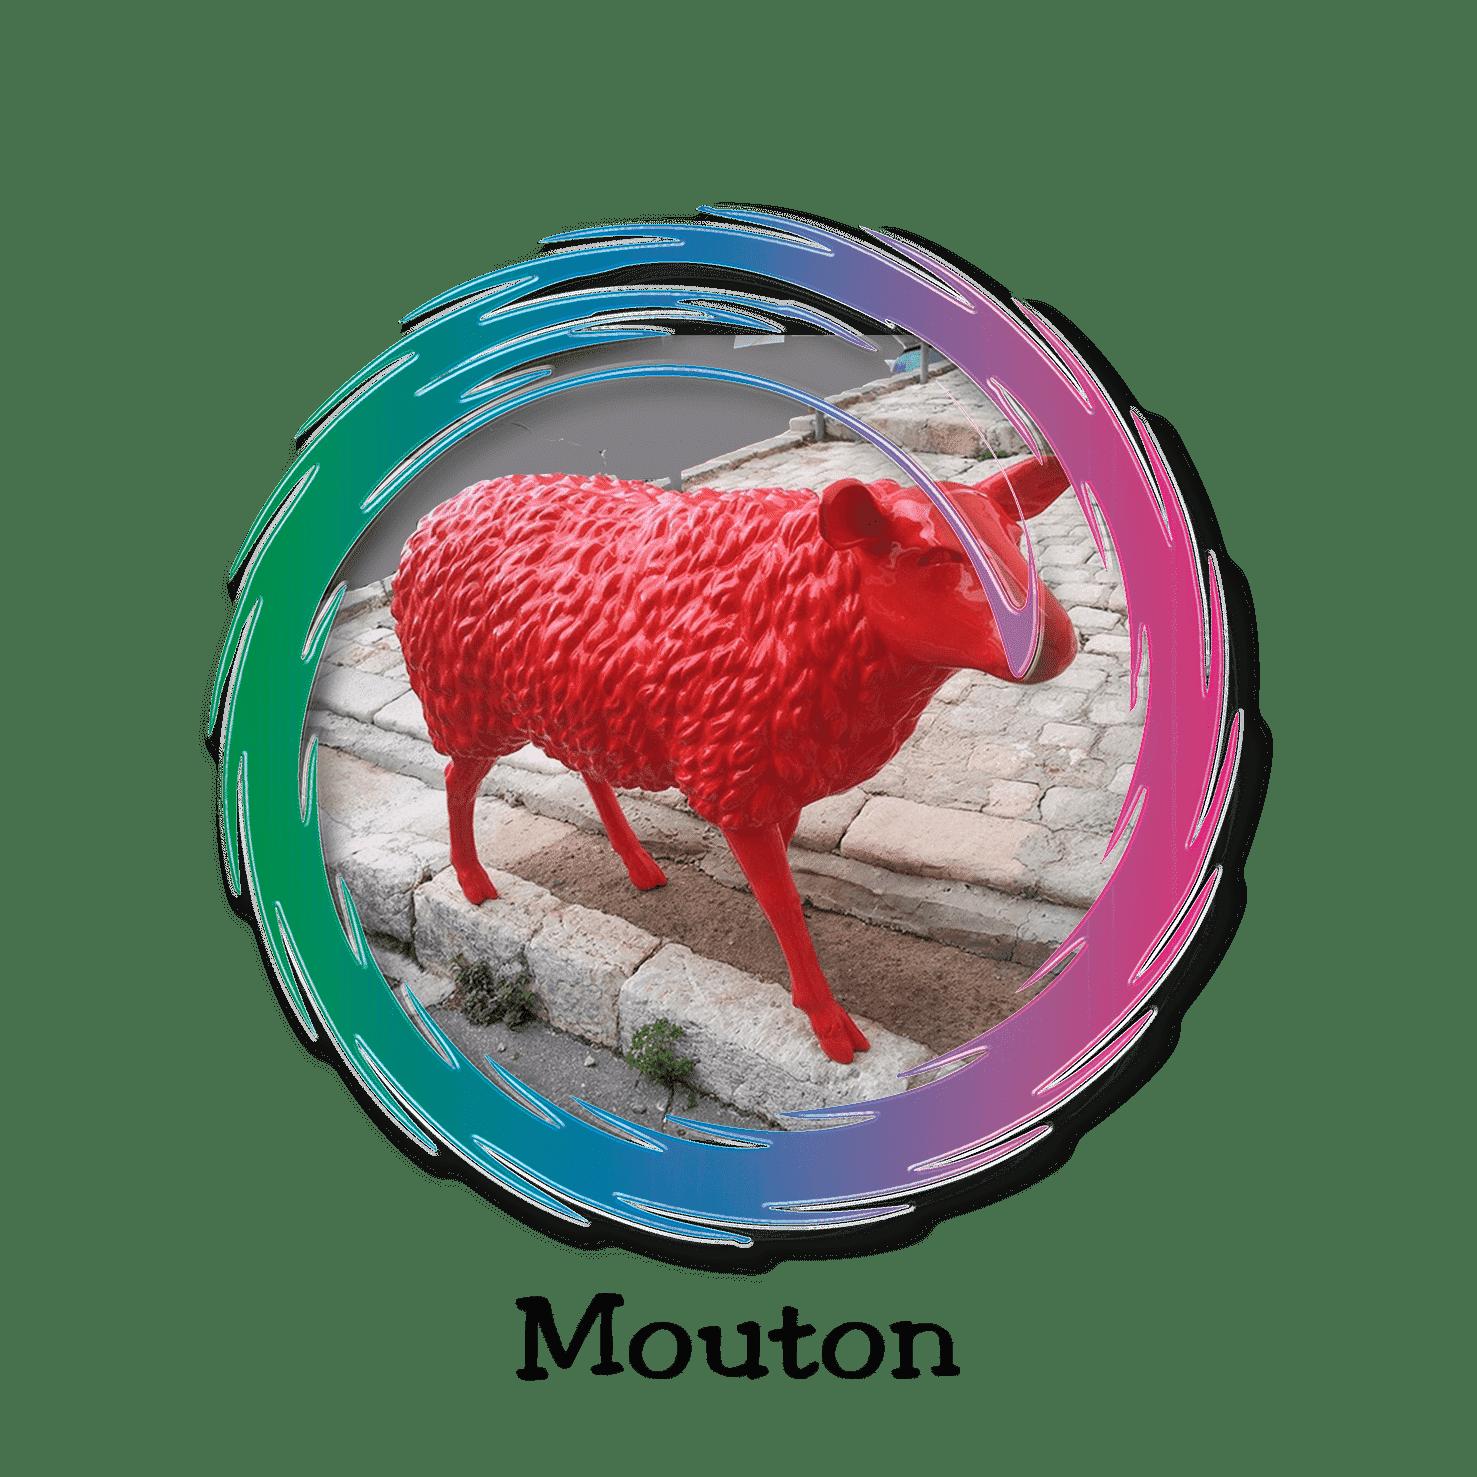 mouton design